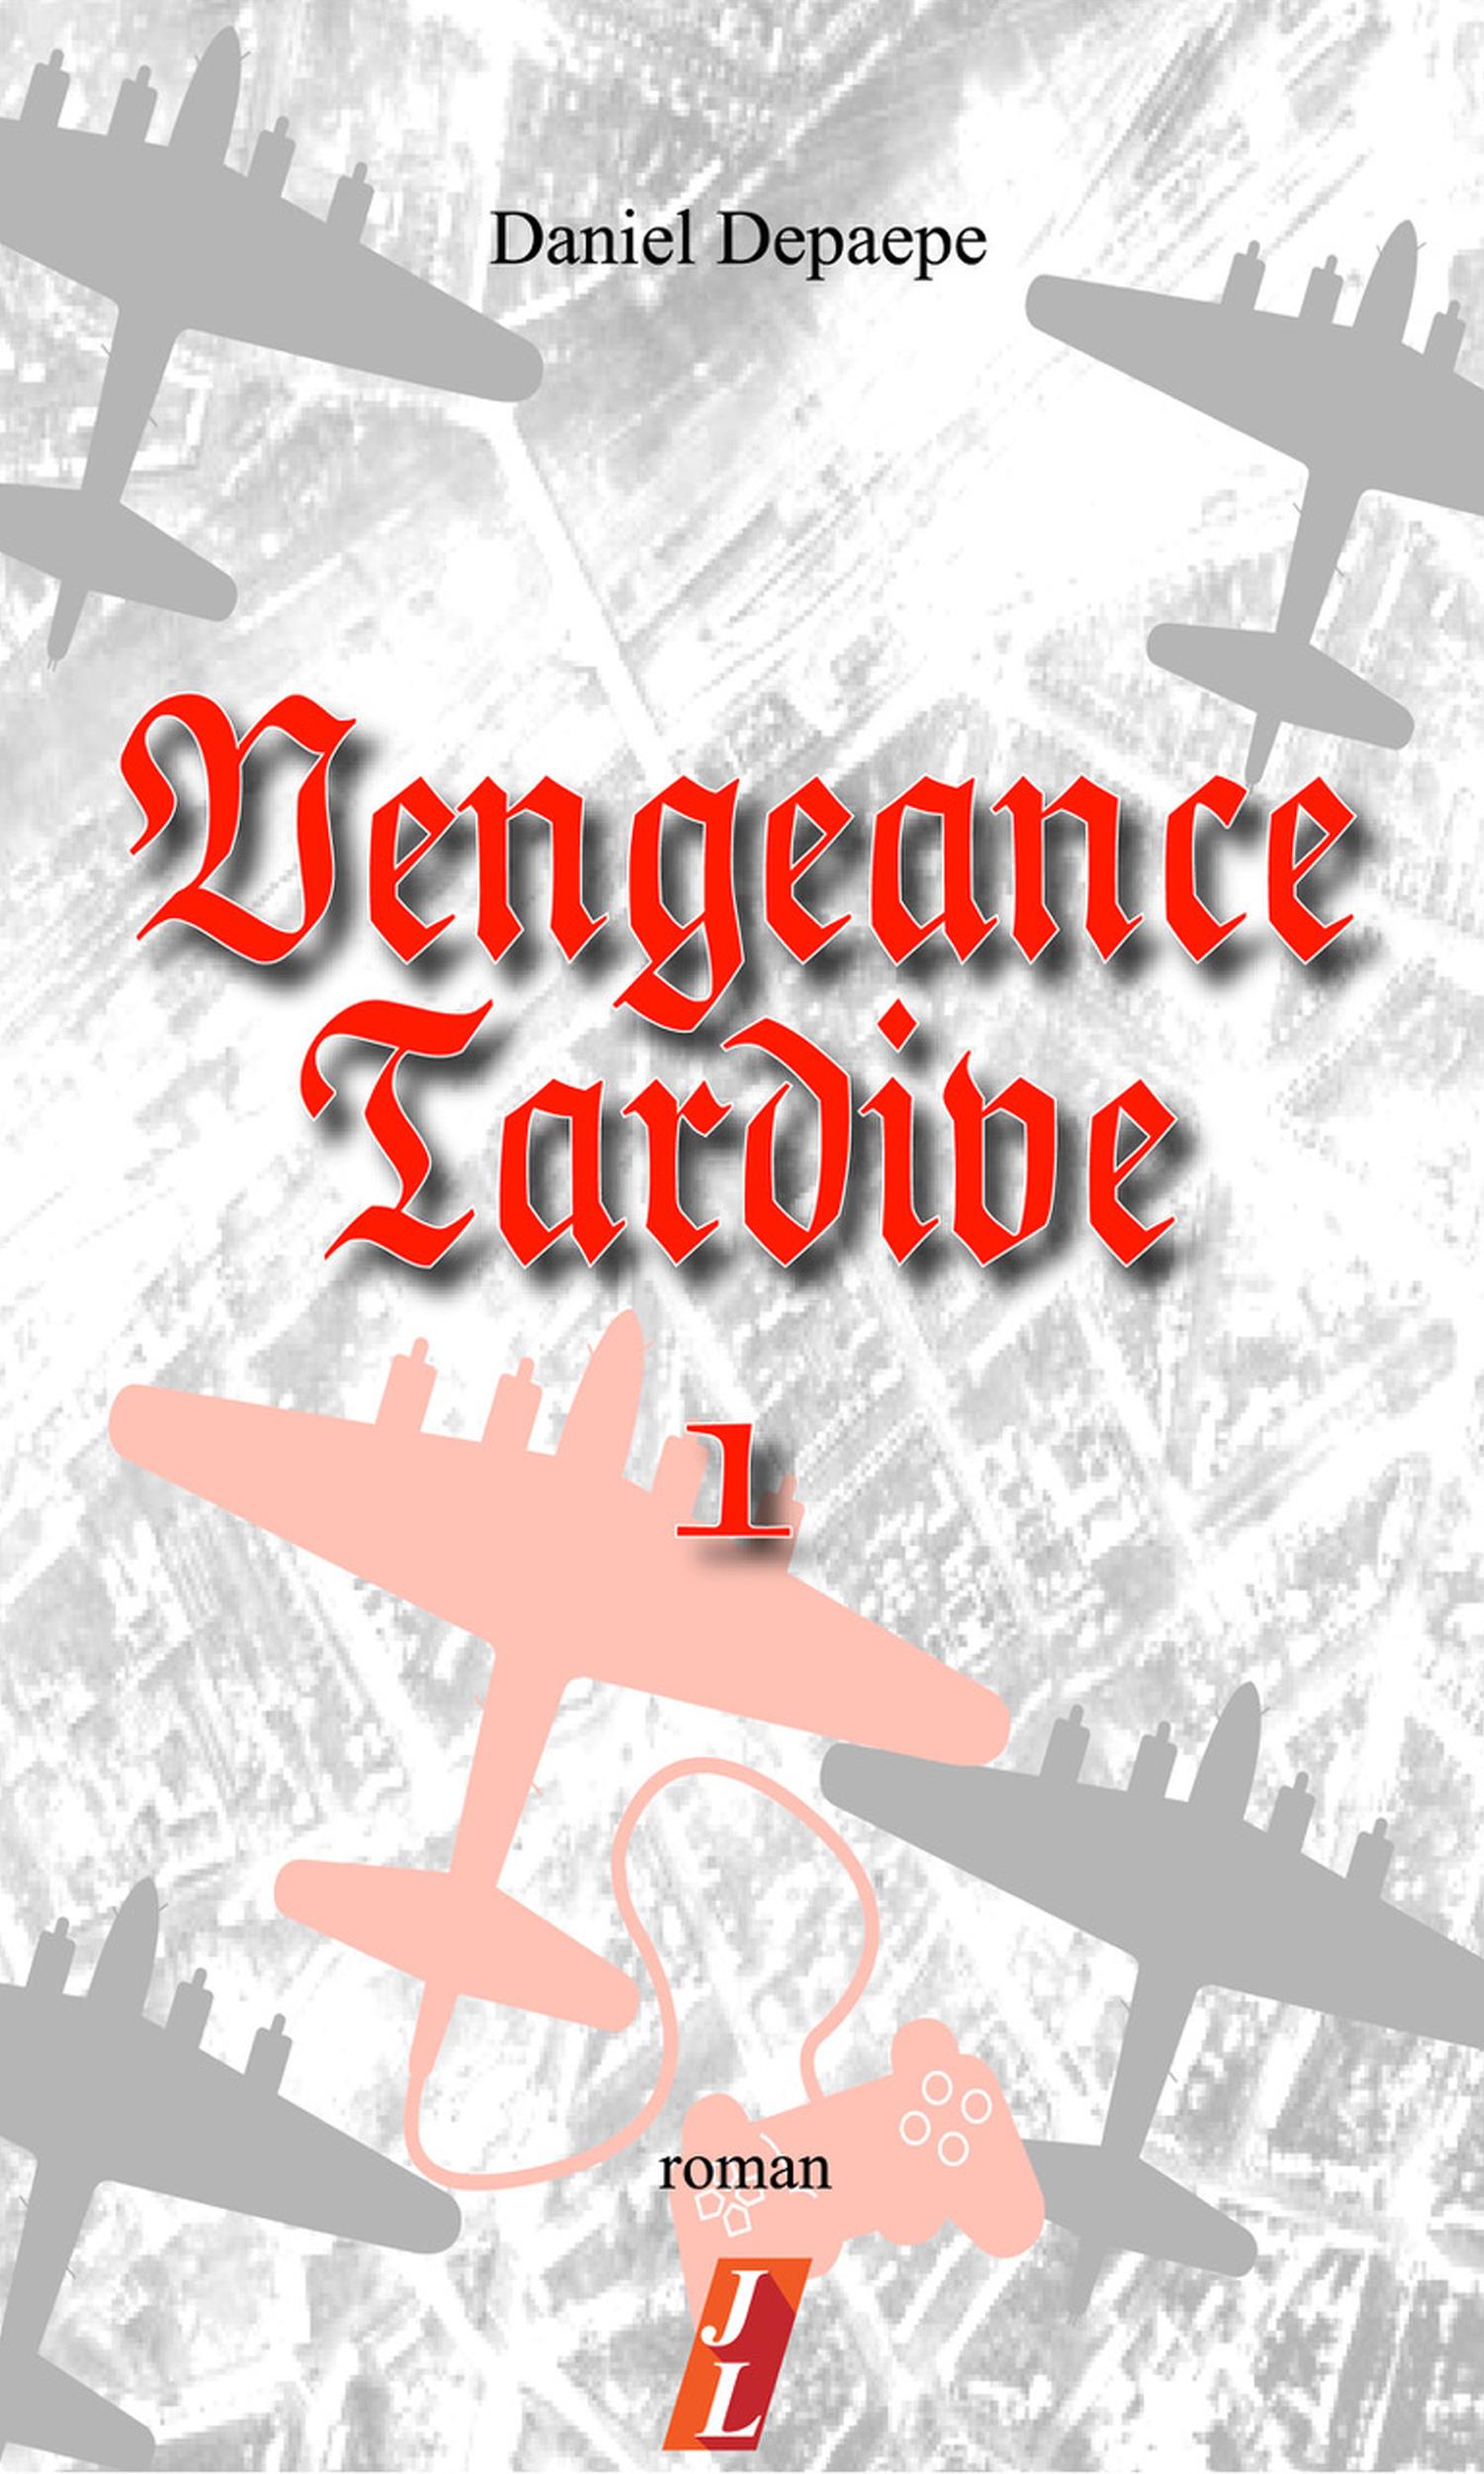 Vengeance tardive (Part 1)